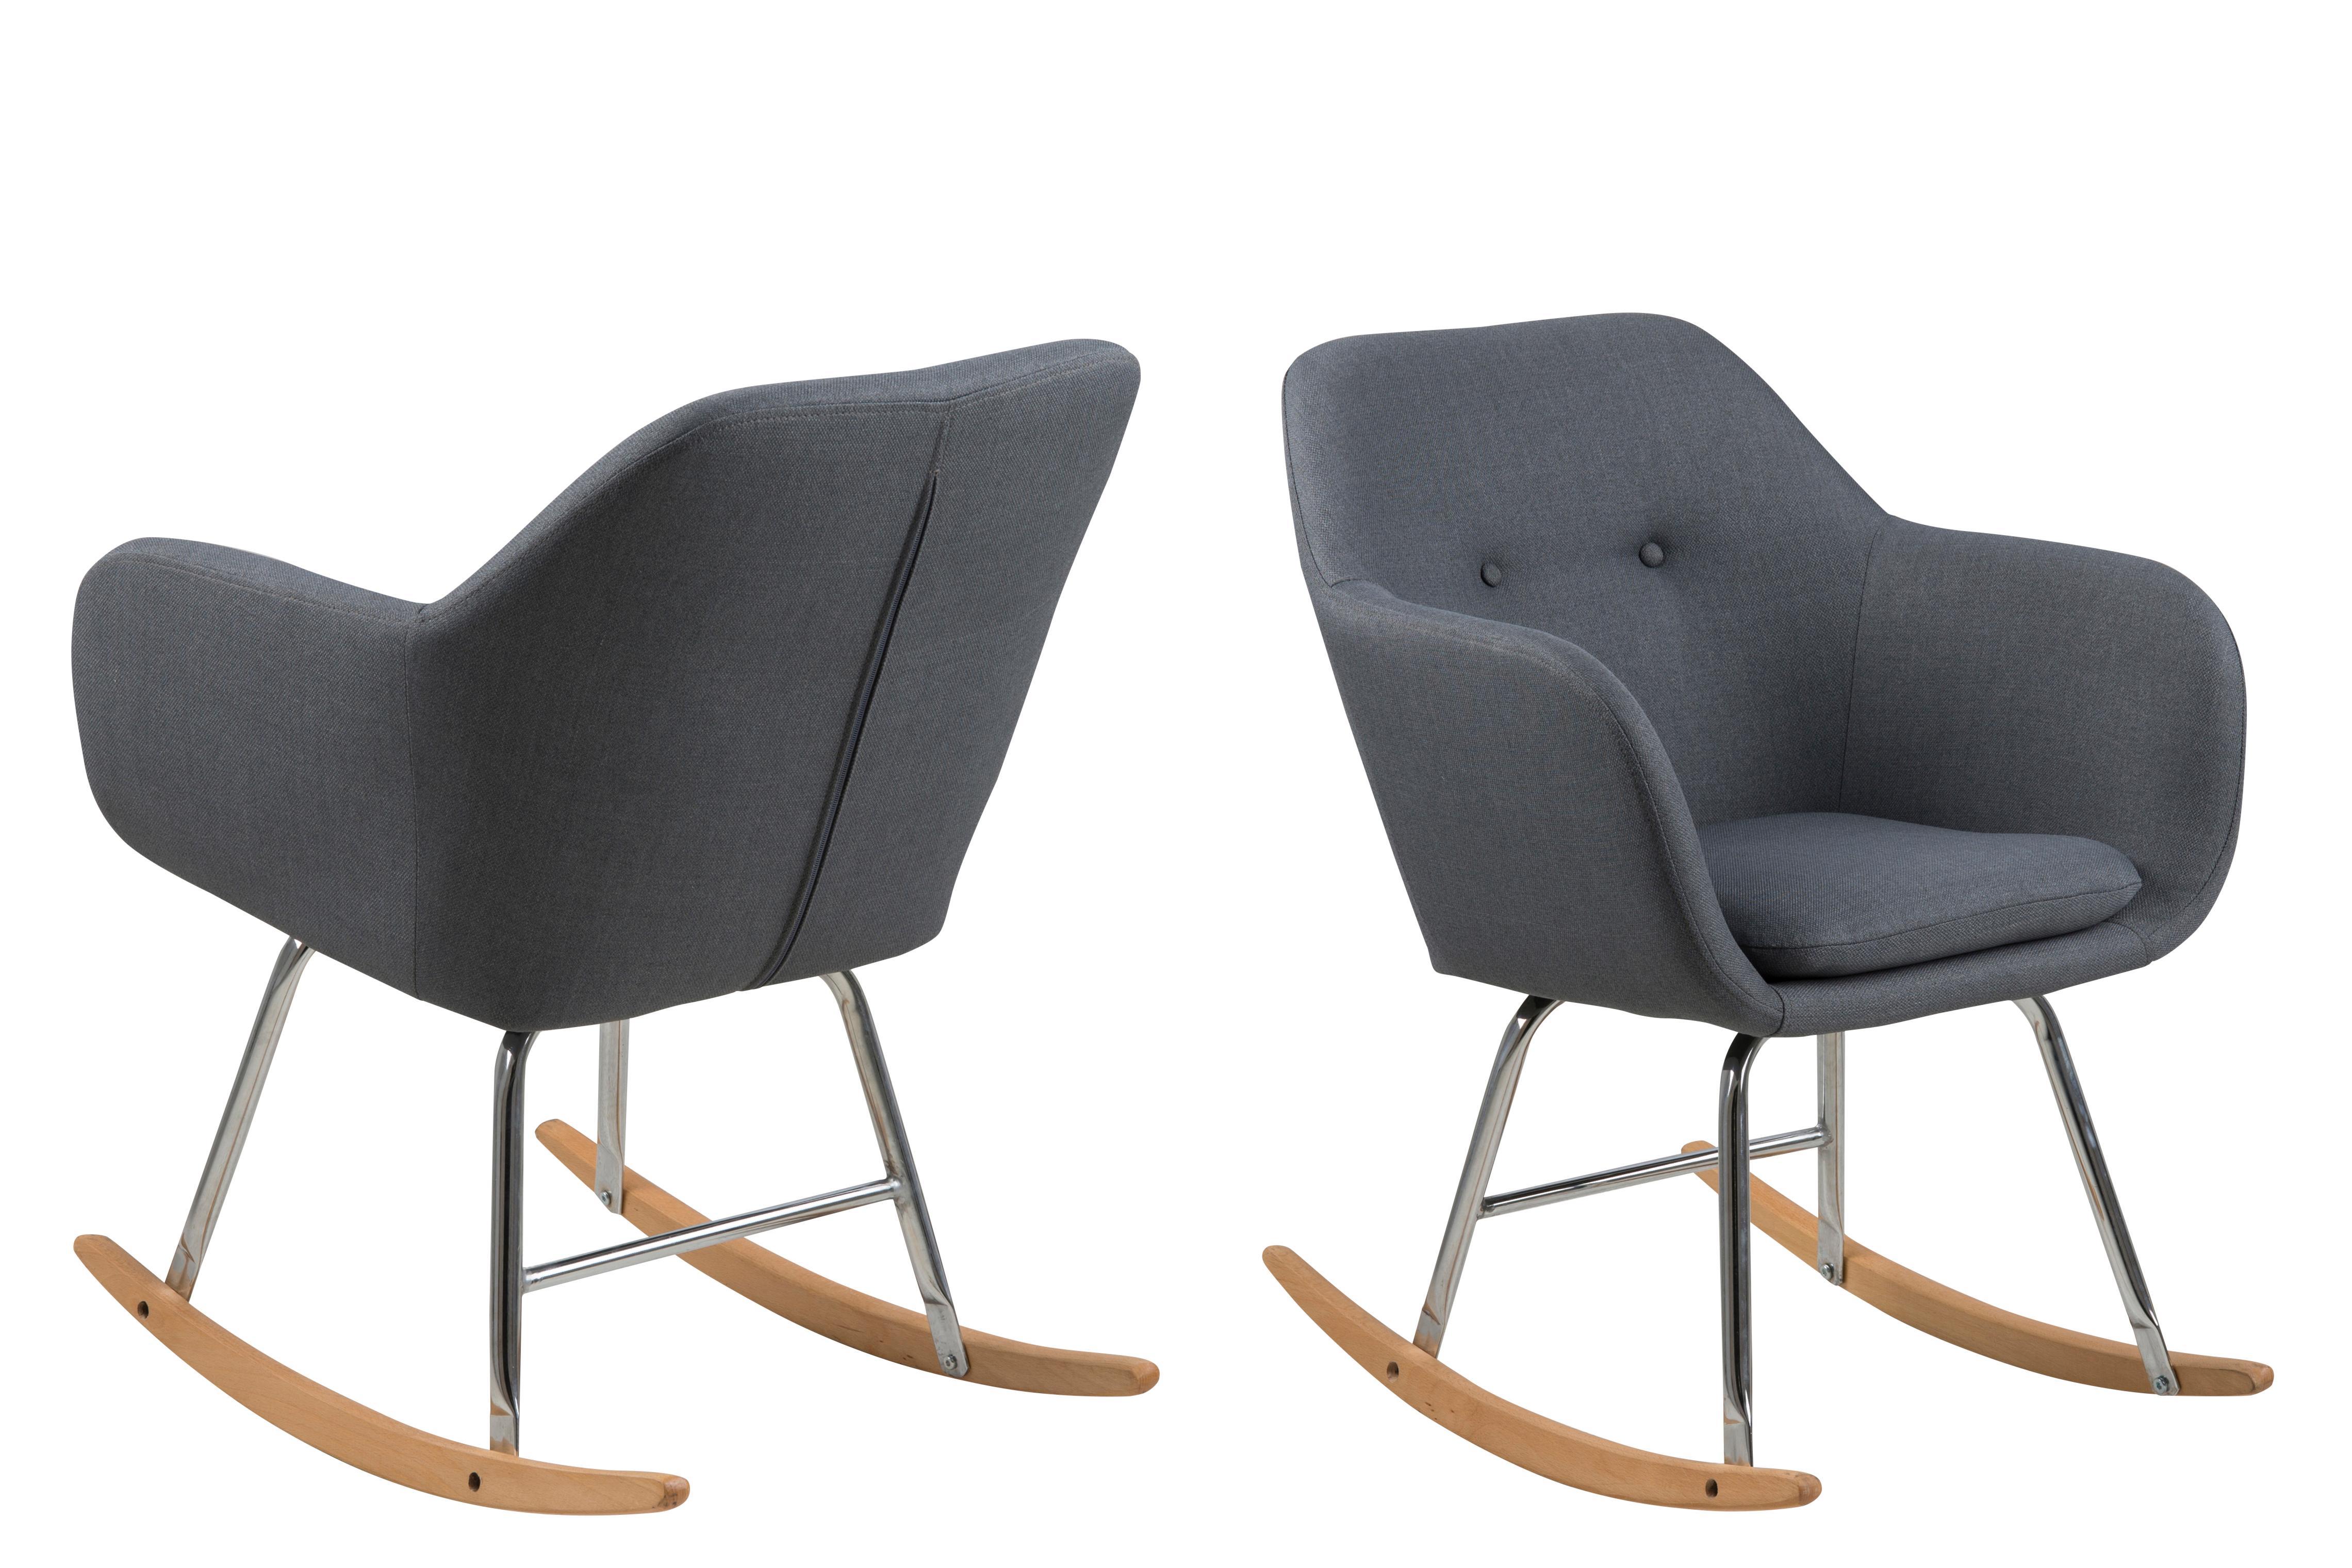 Ac design furniture 64790 schaukelstuhl stoff dunkelgrau for Ac design stuhl nora